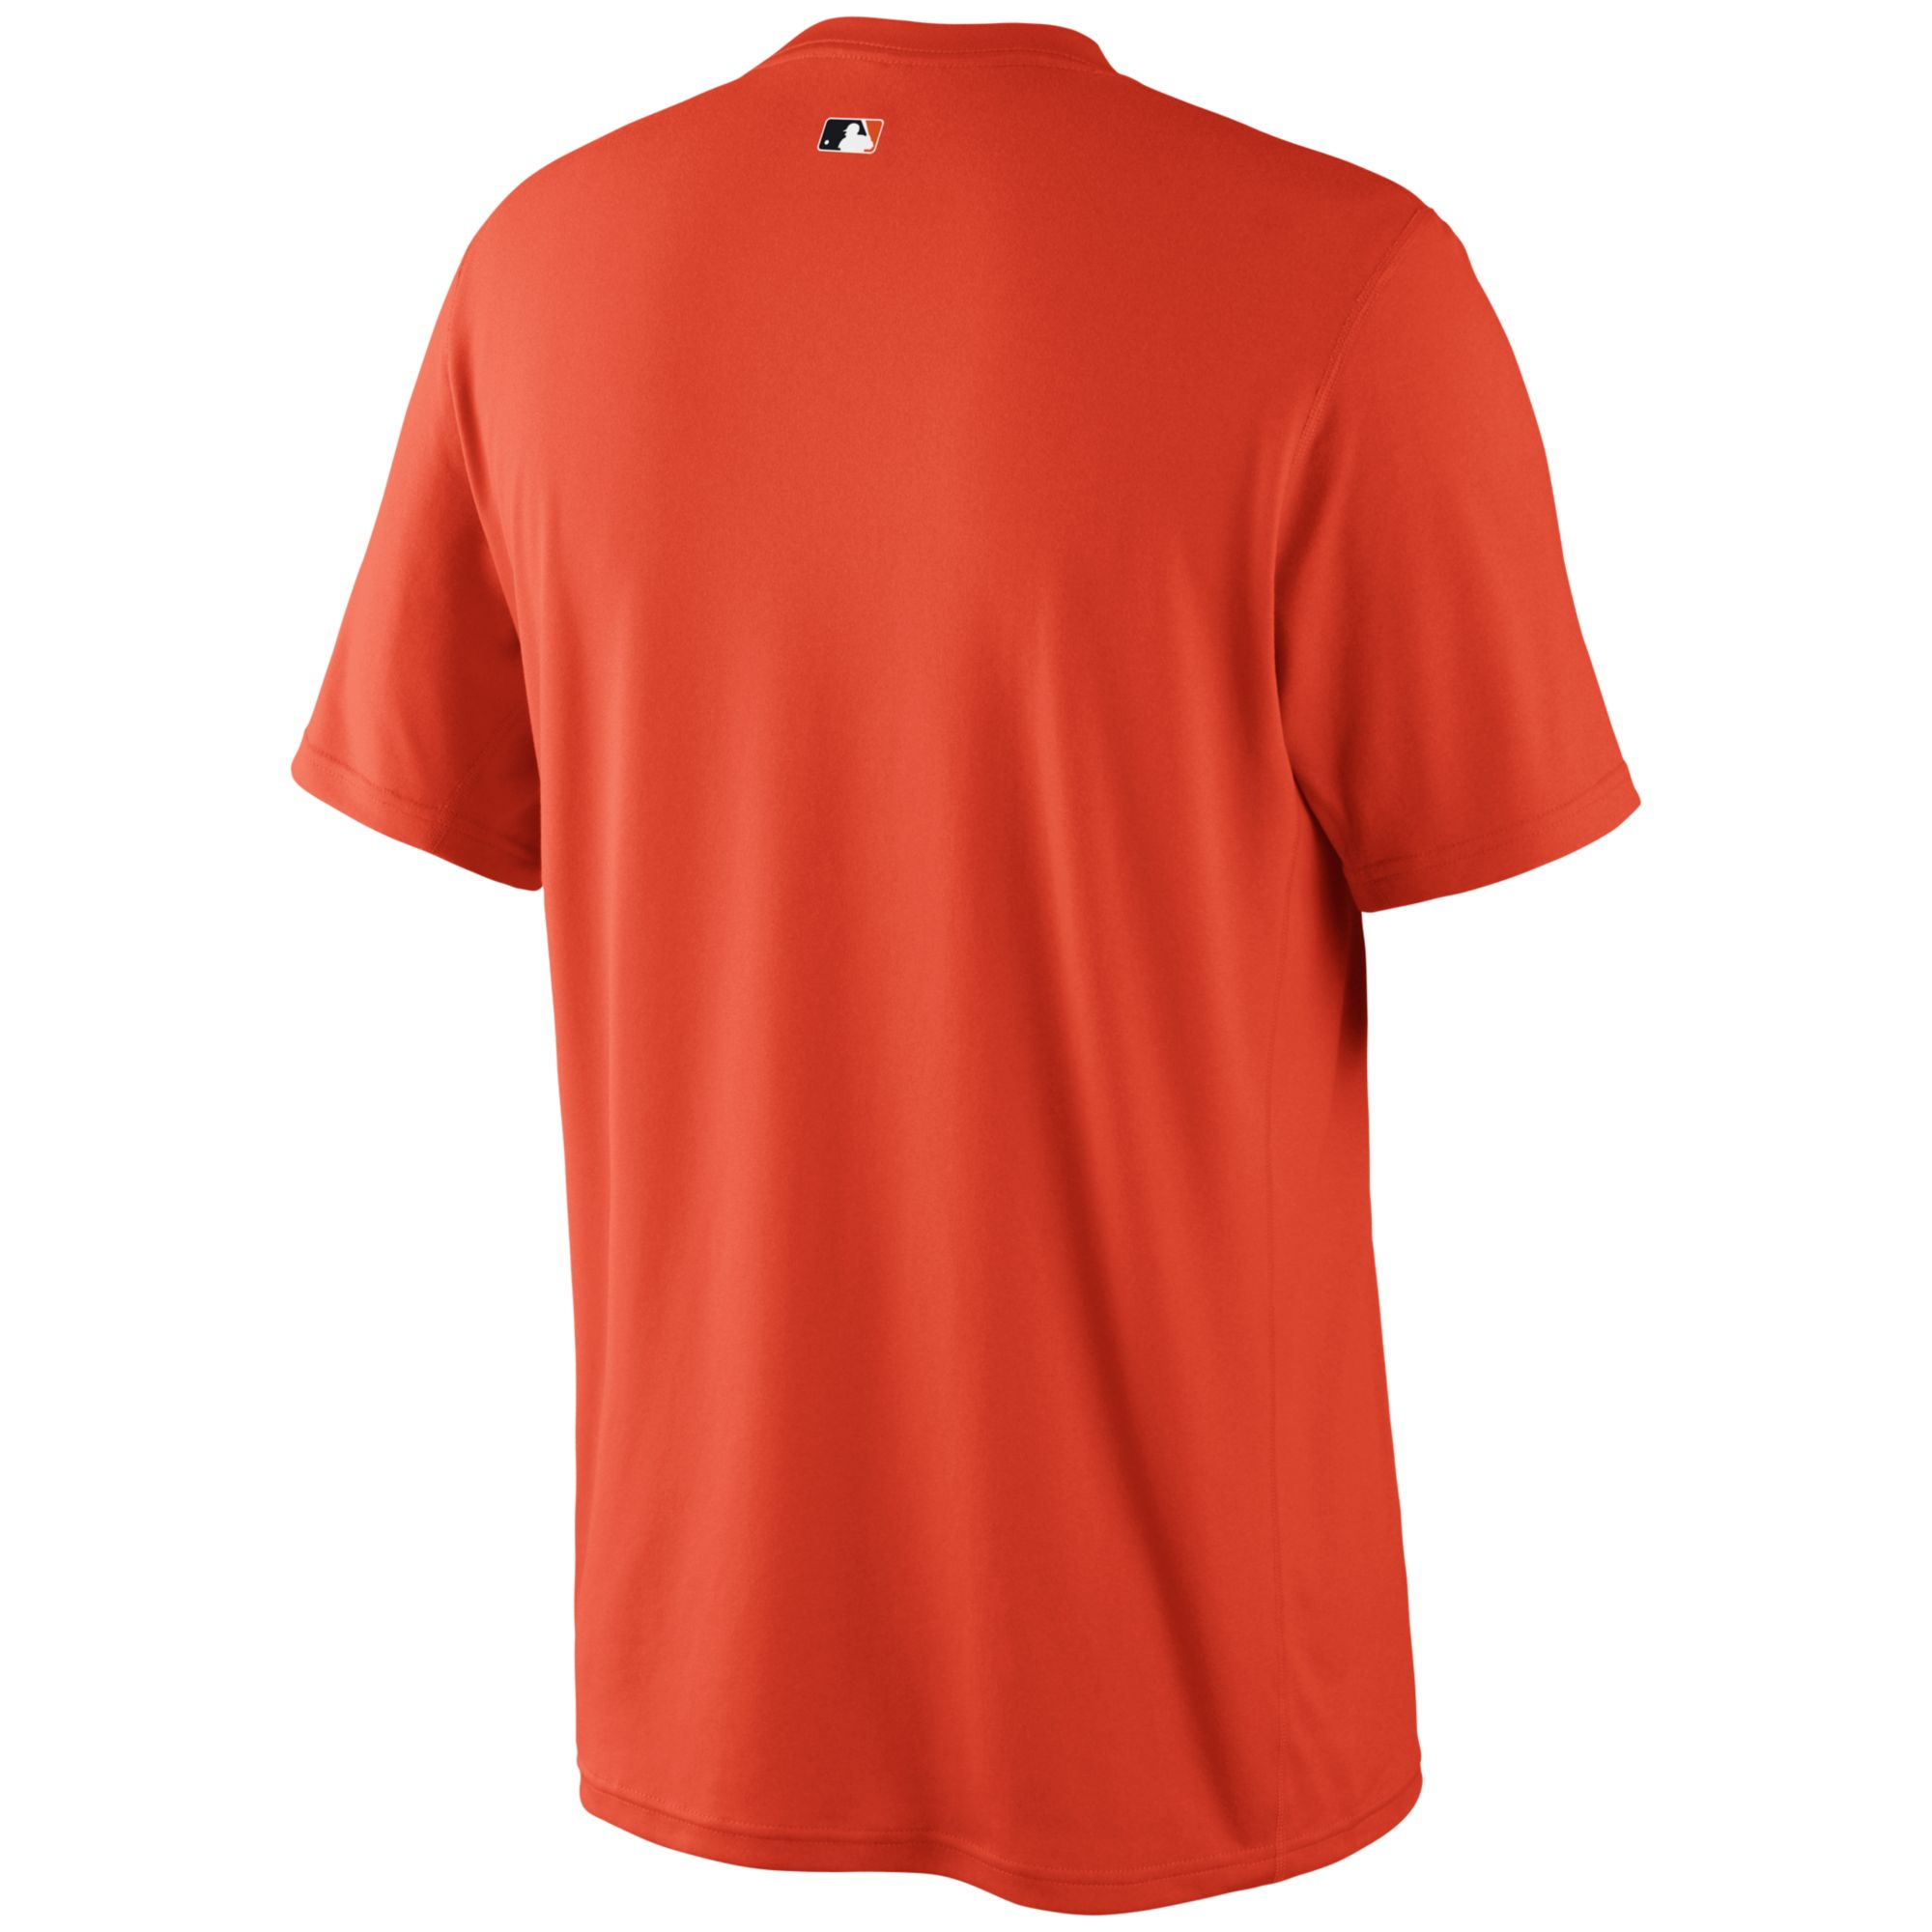 Nike men 39 s short sleeve dri fit miami marlins t shirt in for Nike short sleeve shirt